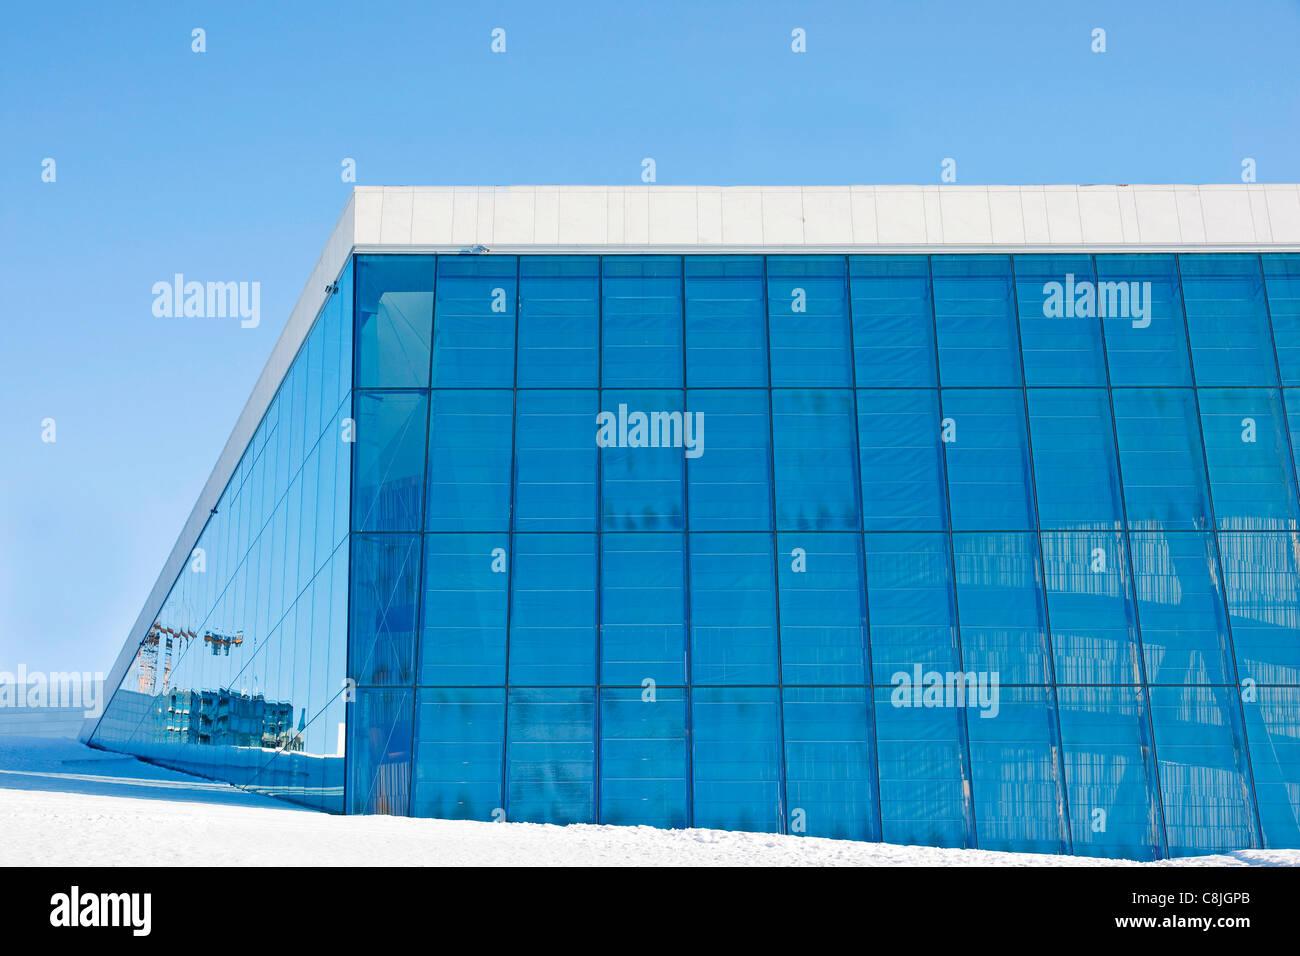 Opera house in Oslo - Stock Image